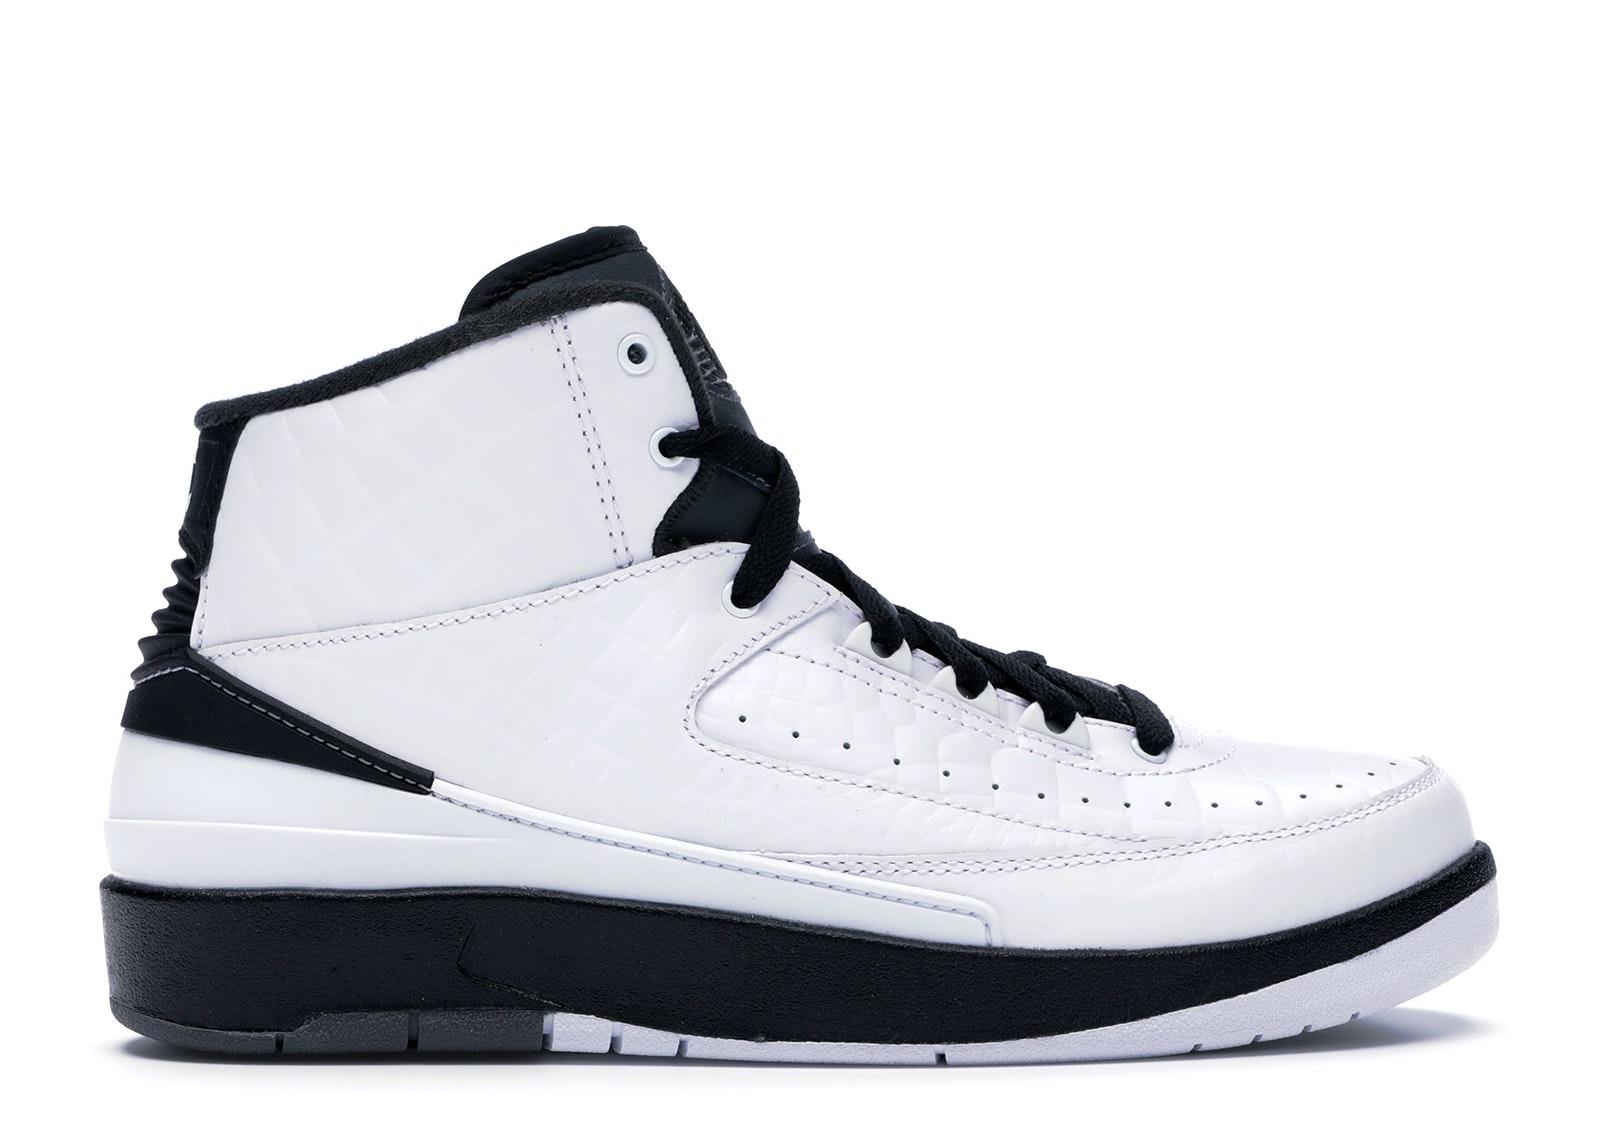 Jordan 2 Retro Wing It (GS)